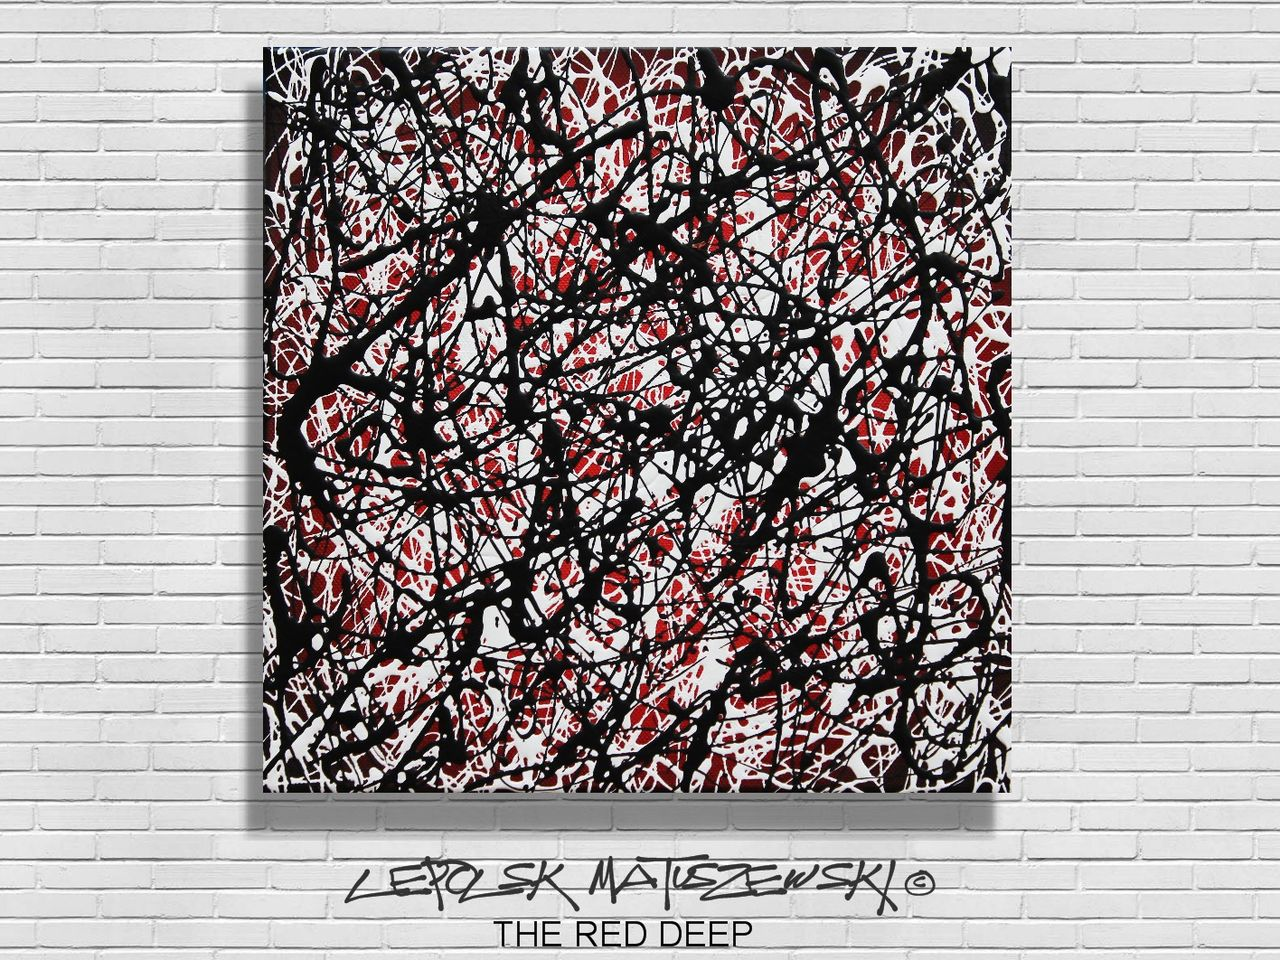 MK  Lepolsk Matuszewski THE RED DEEP   ( expressionnisme abstrait contemporain )